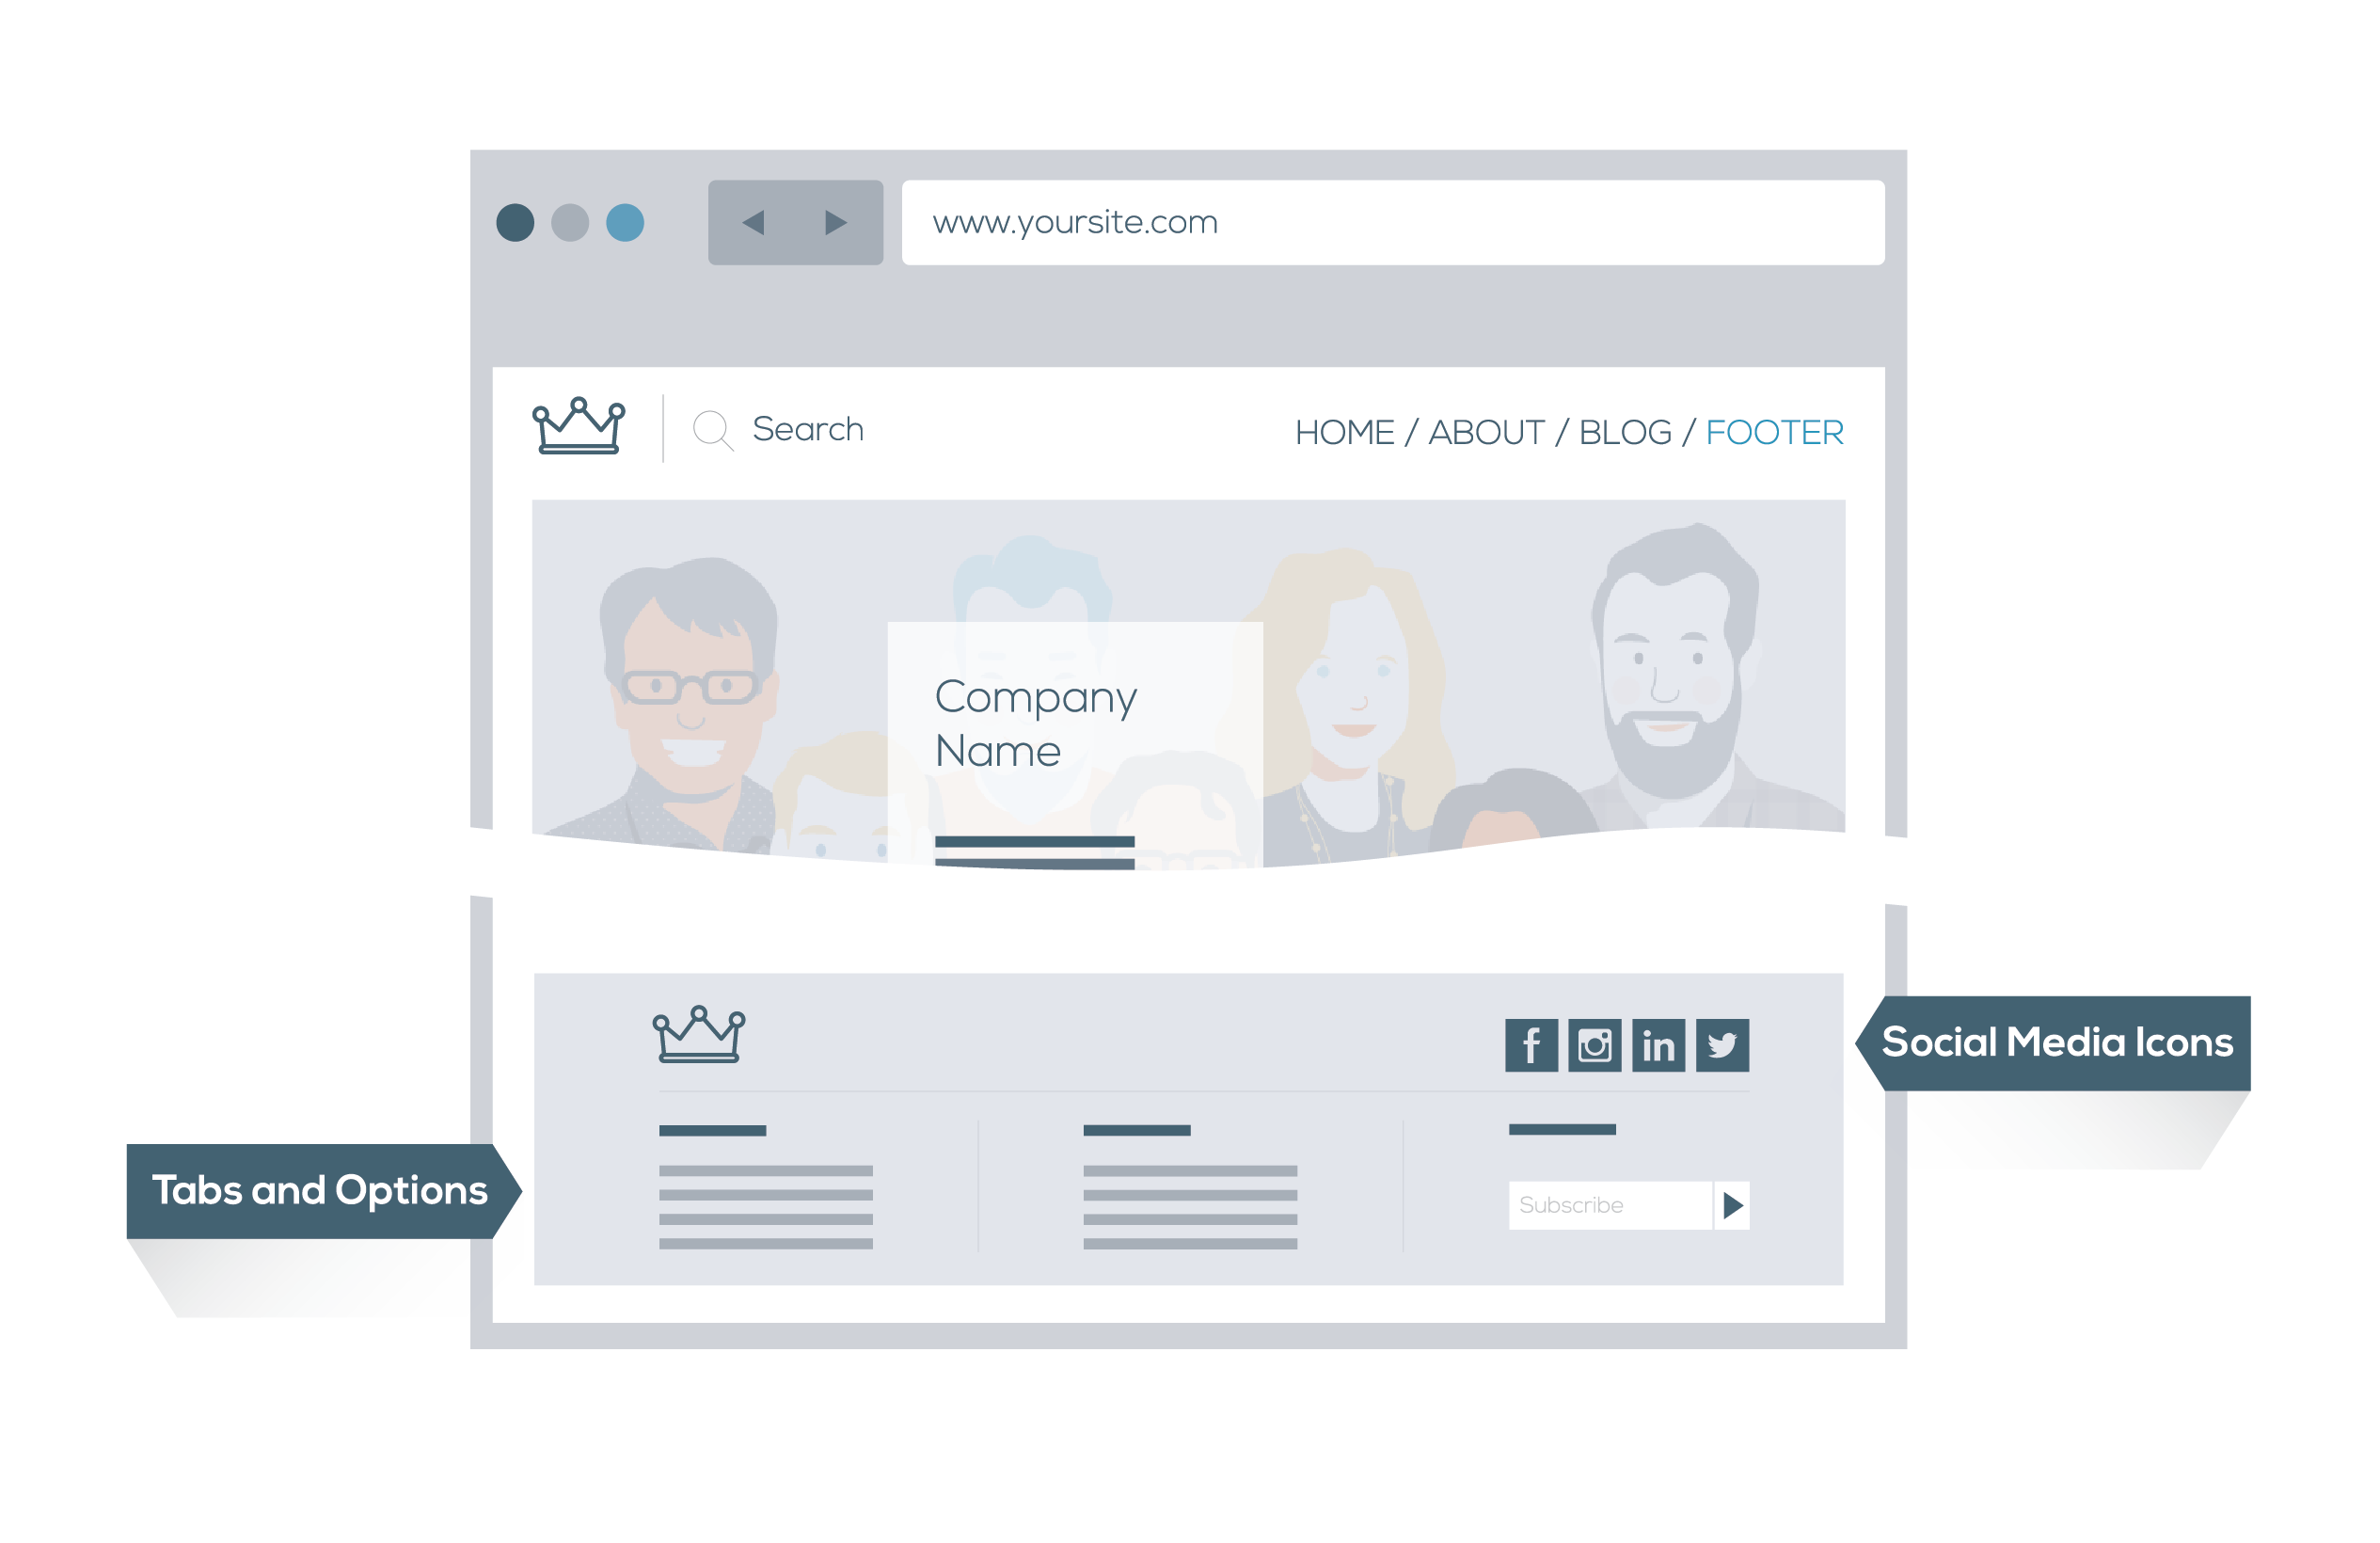 website-footer-features